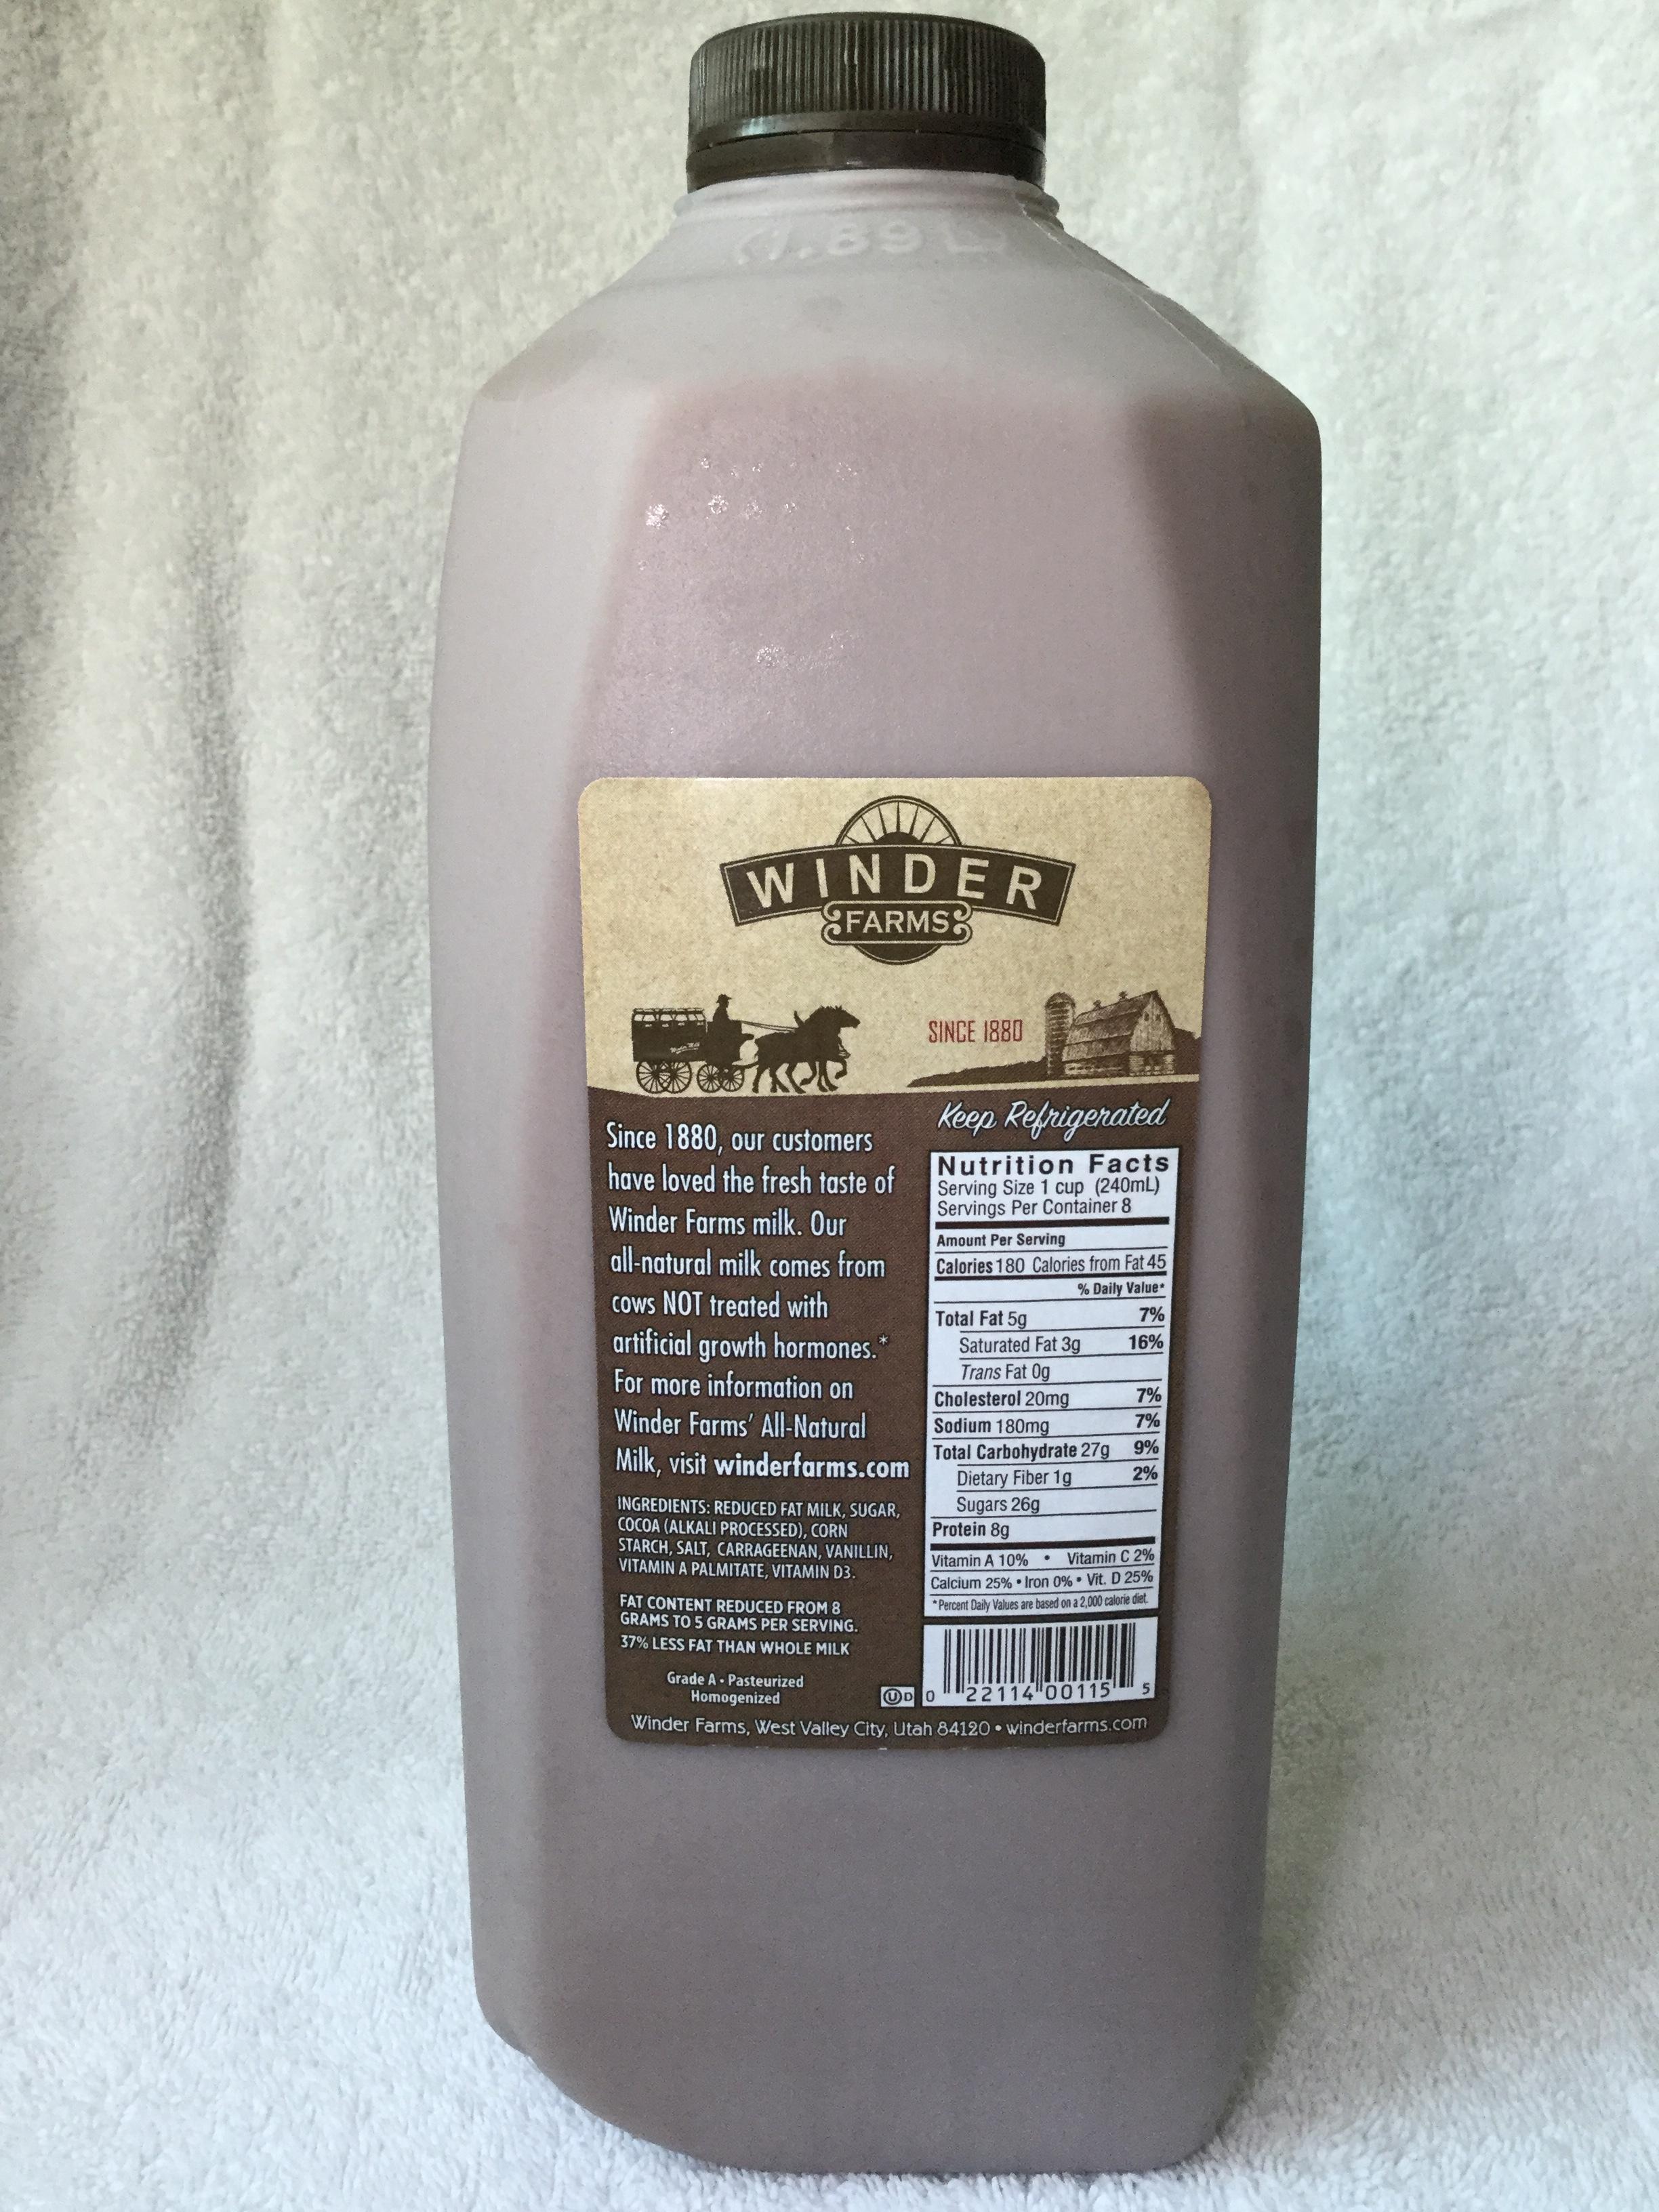 Winder Farms Reduced Fat Chocolate Milk Side 1